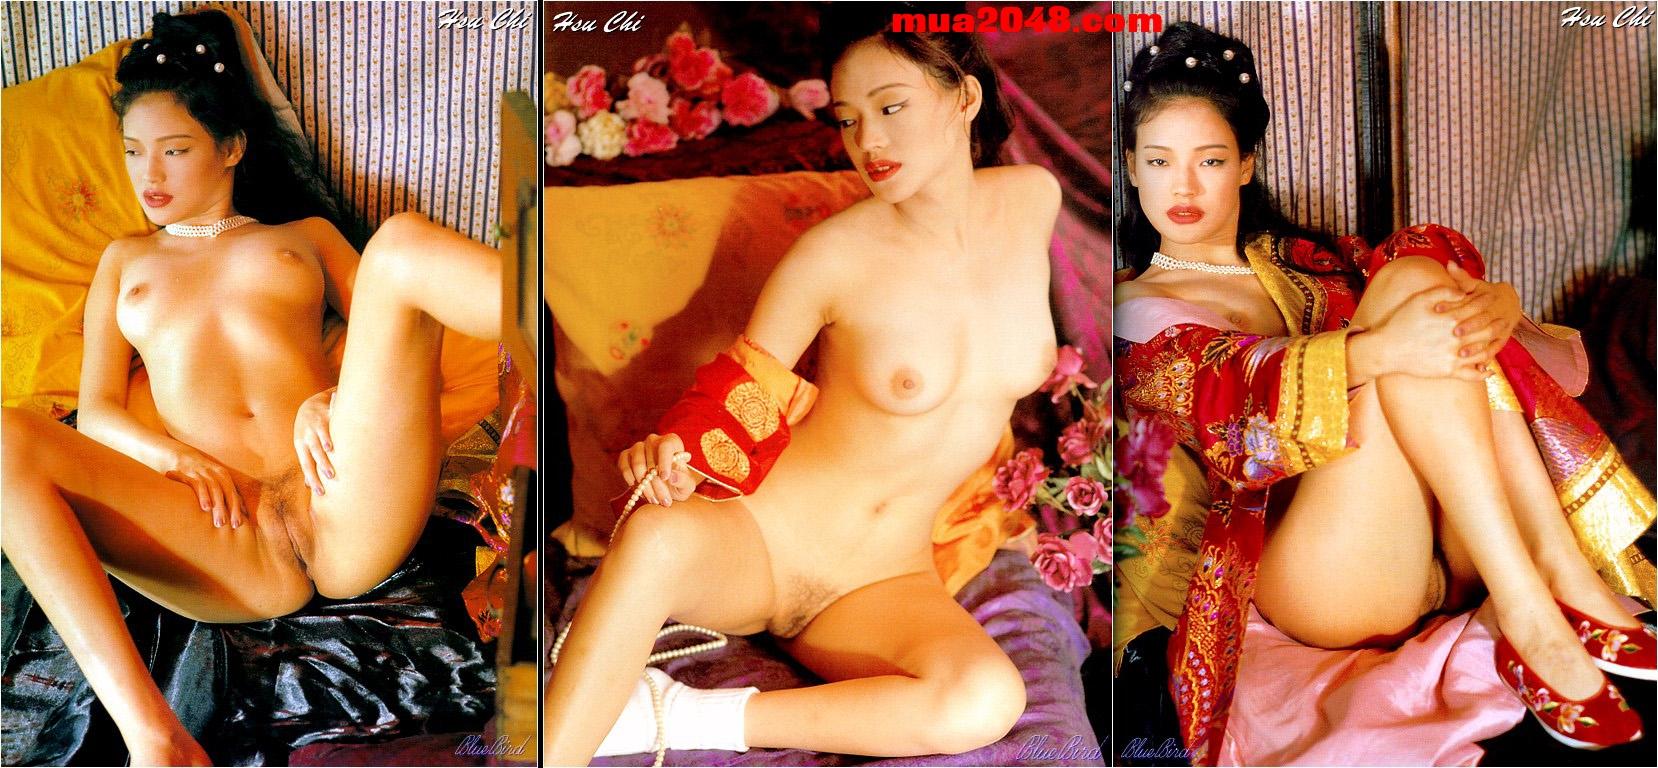 Livejasmin lesbian liching pusy webcam porn galeries